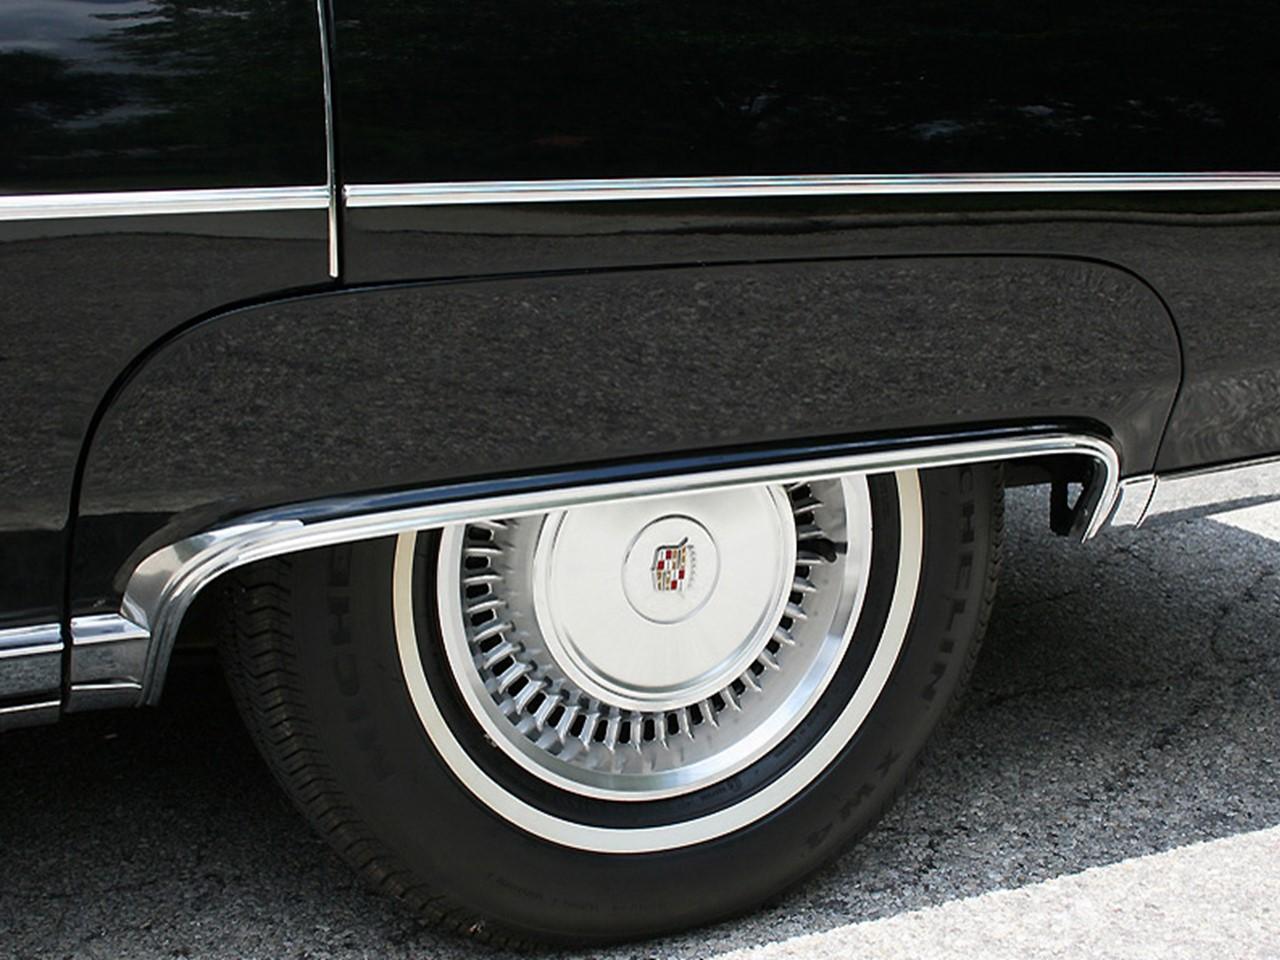 1972 Fleetwood 15